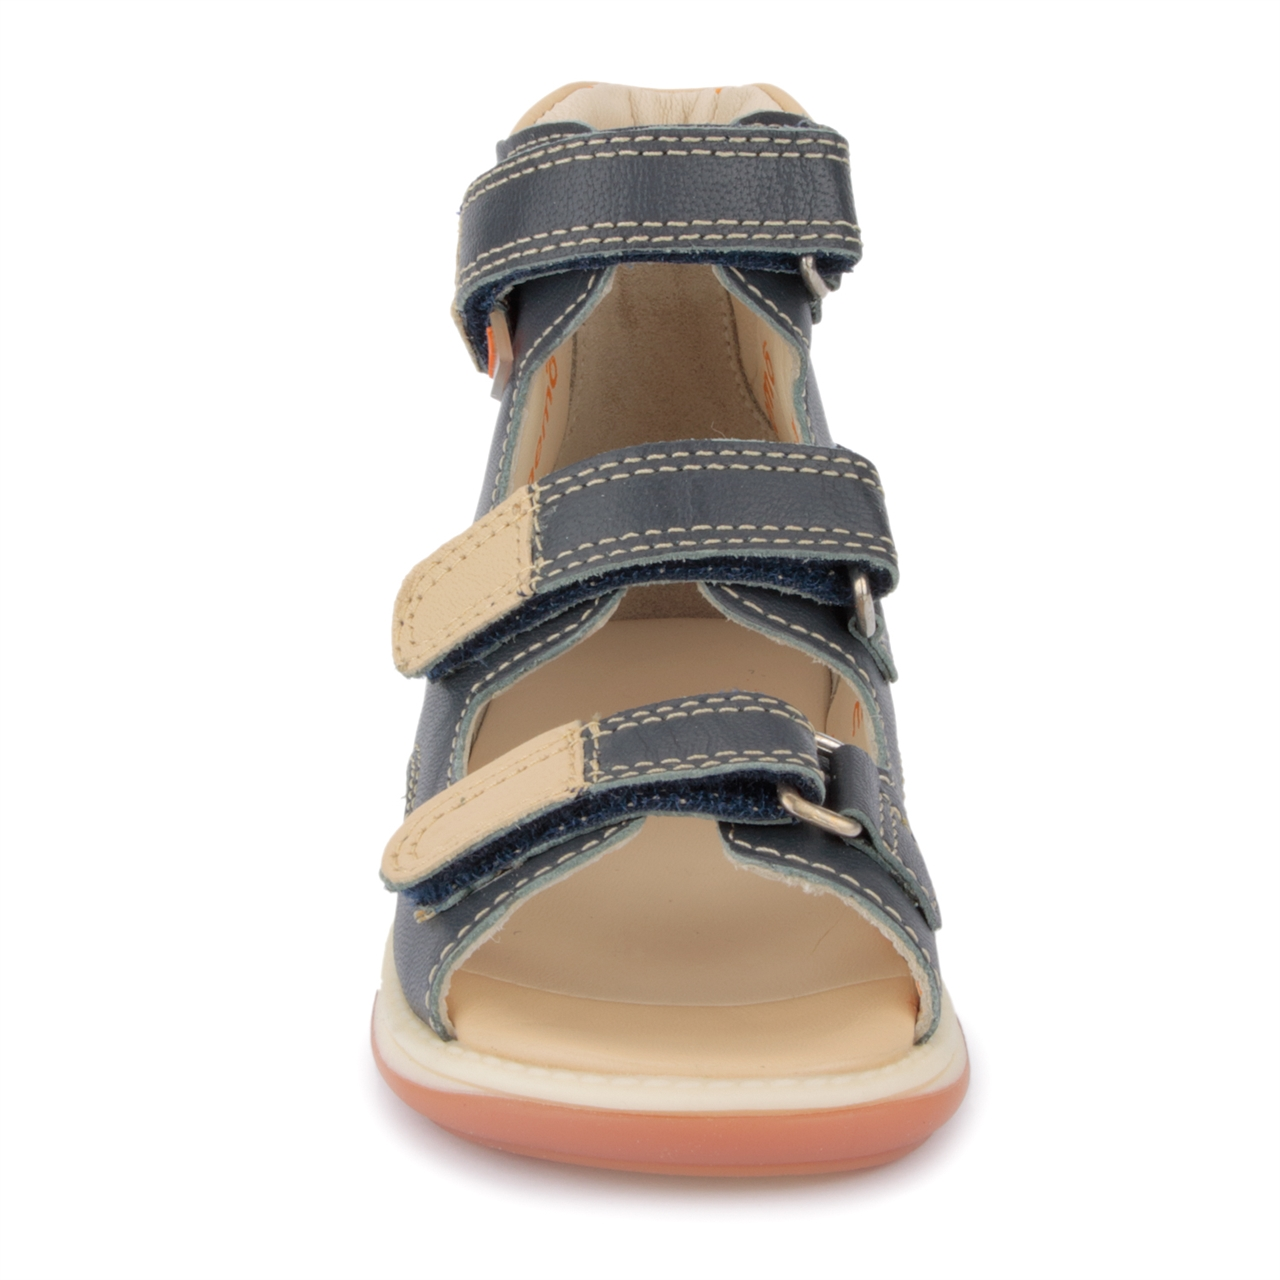 2b7ccab74361 ... Picture of Memo Apollo 3DA Black Toddler Boy Orthopedic Velcro Sandal  ...